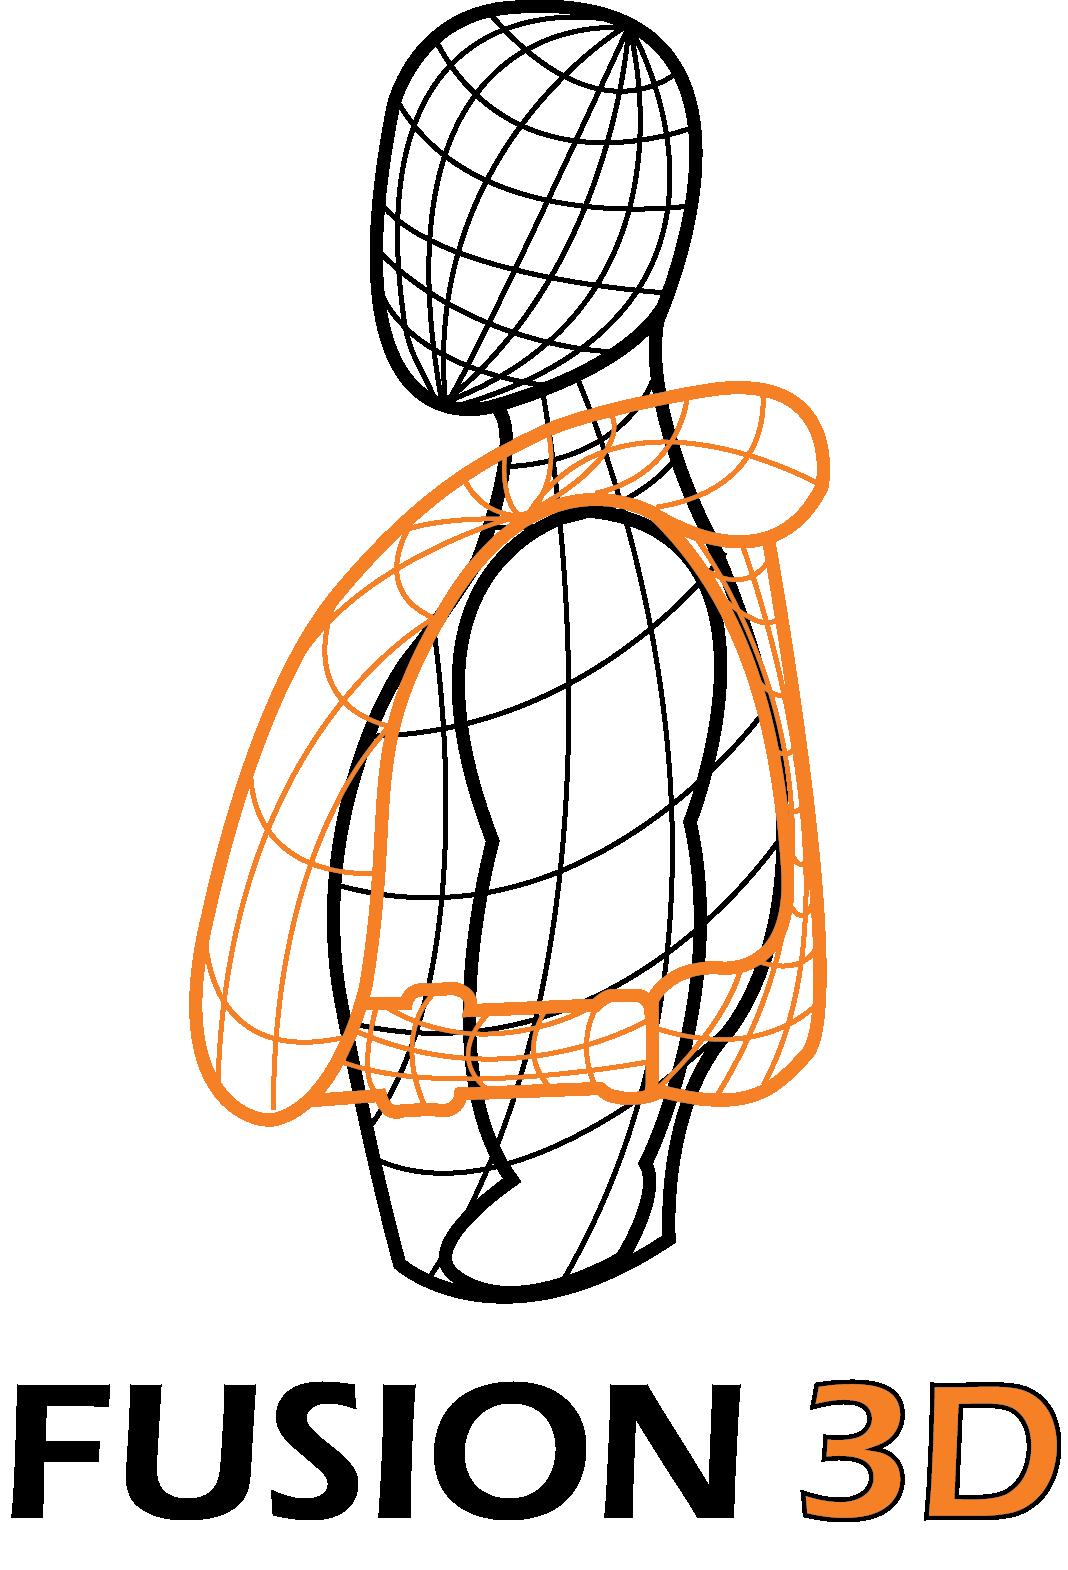 Fusion_3D_logo_black.png